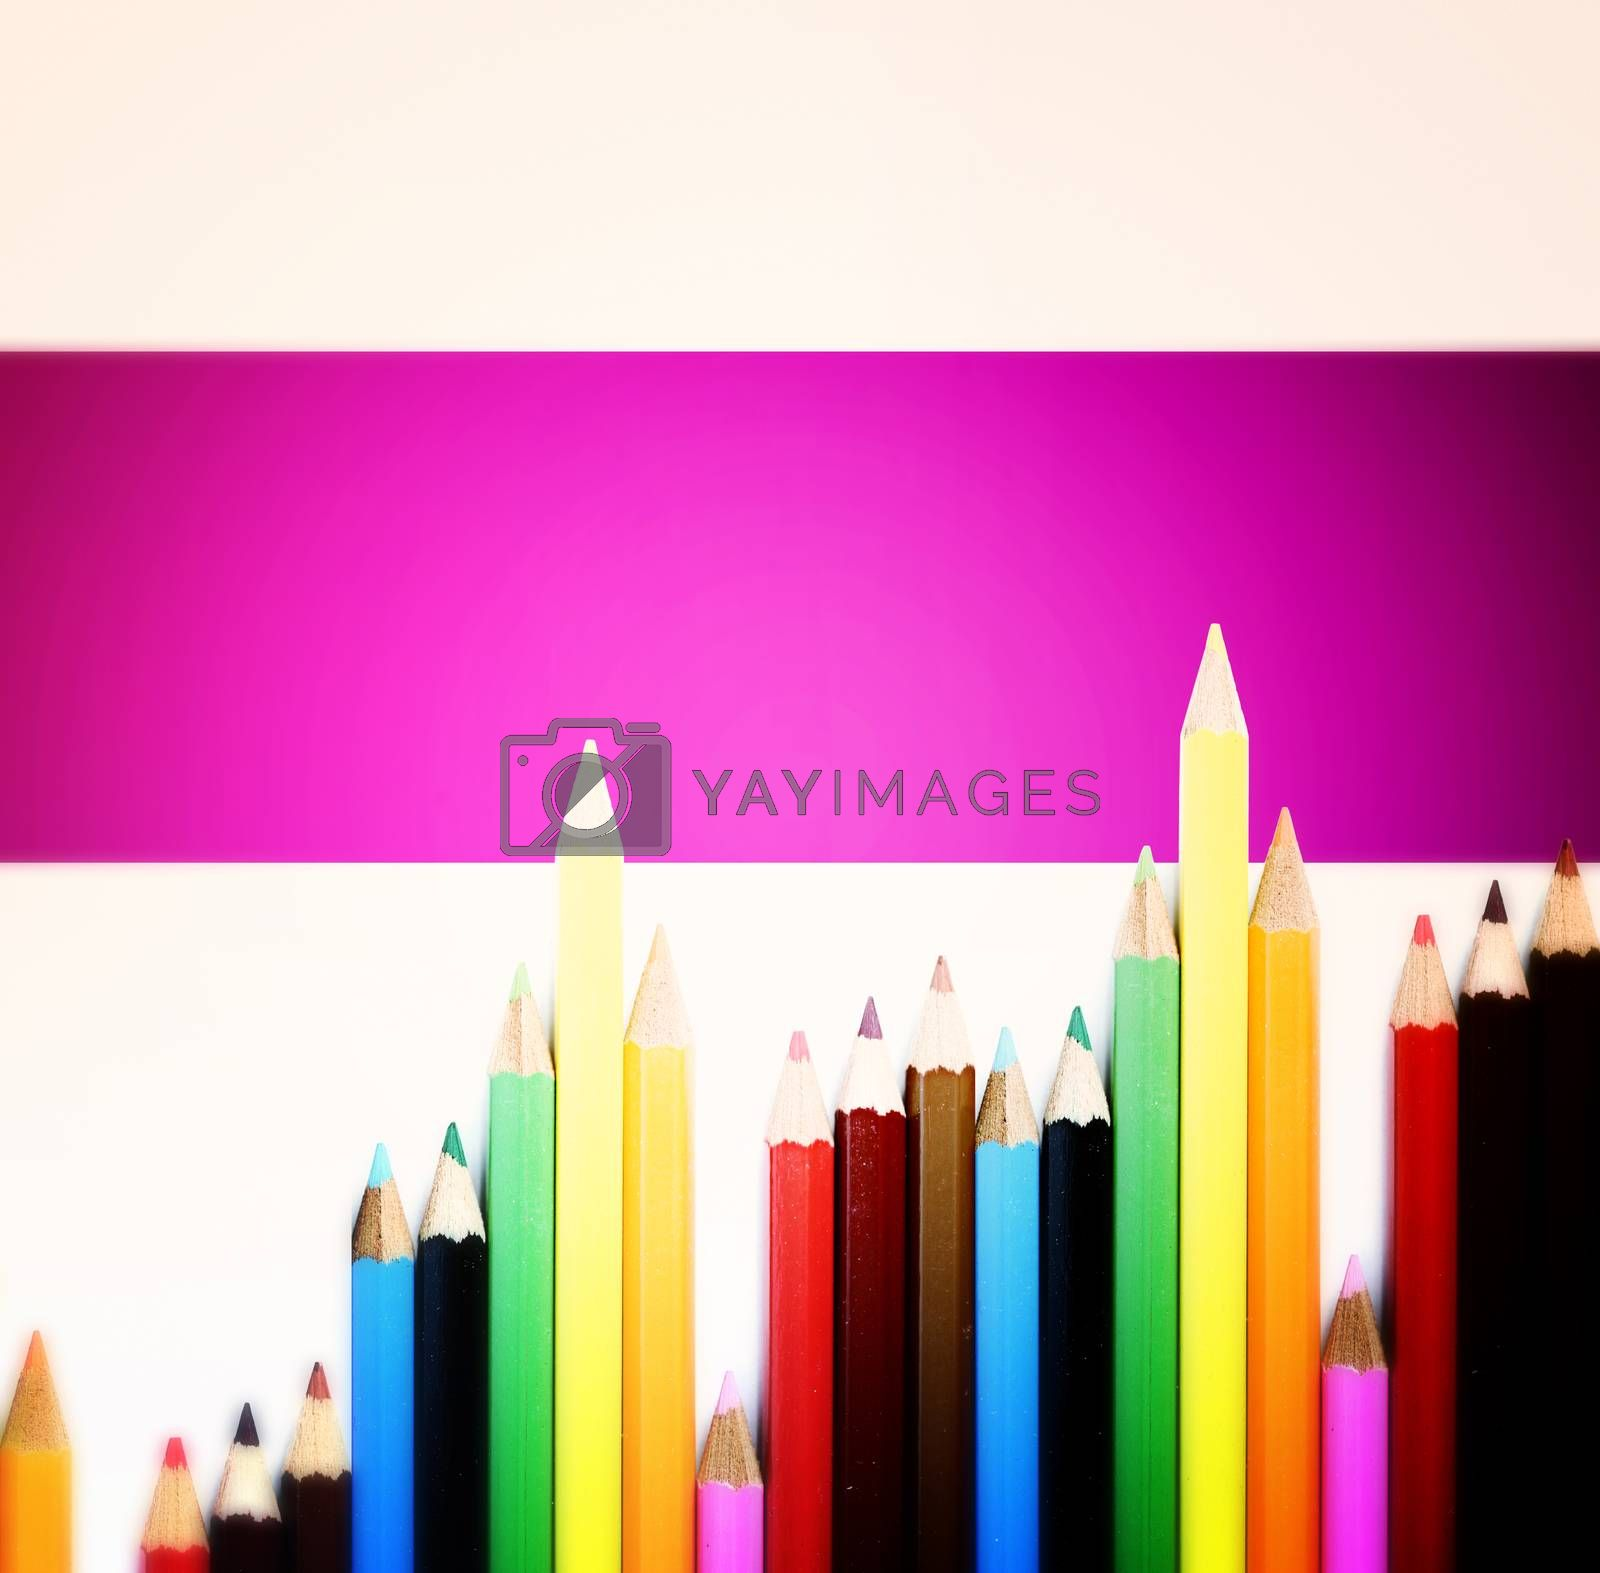 Close-up picture of color pencils assortment.